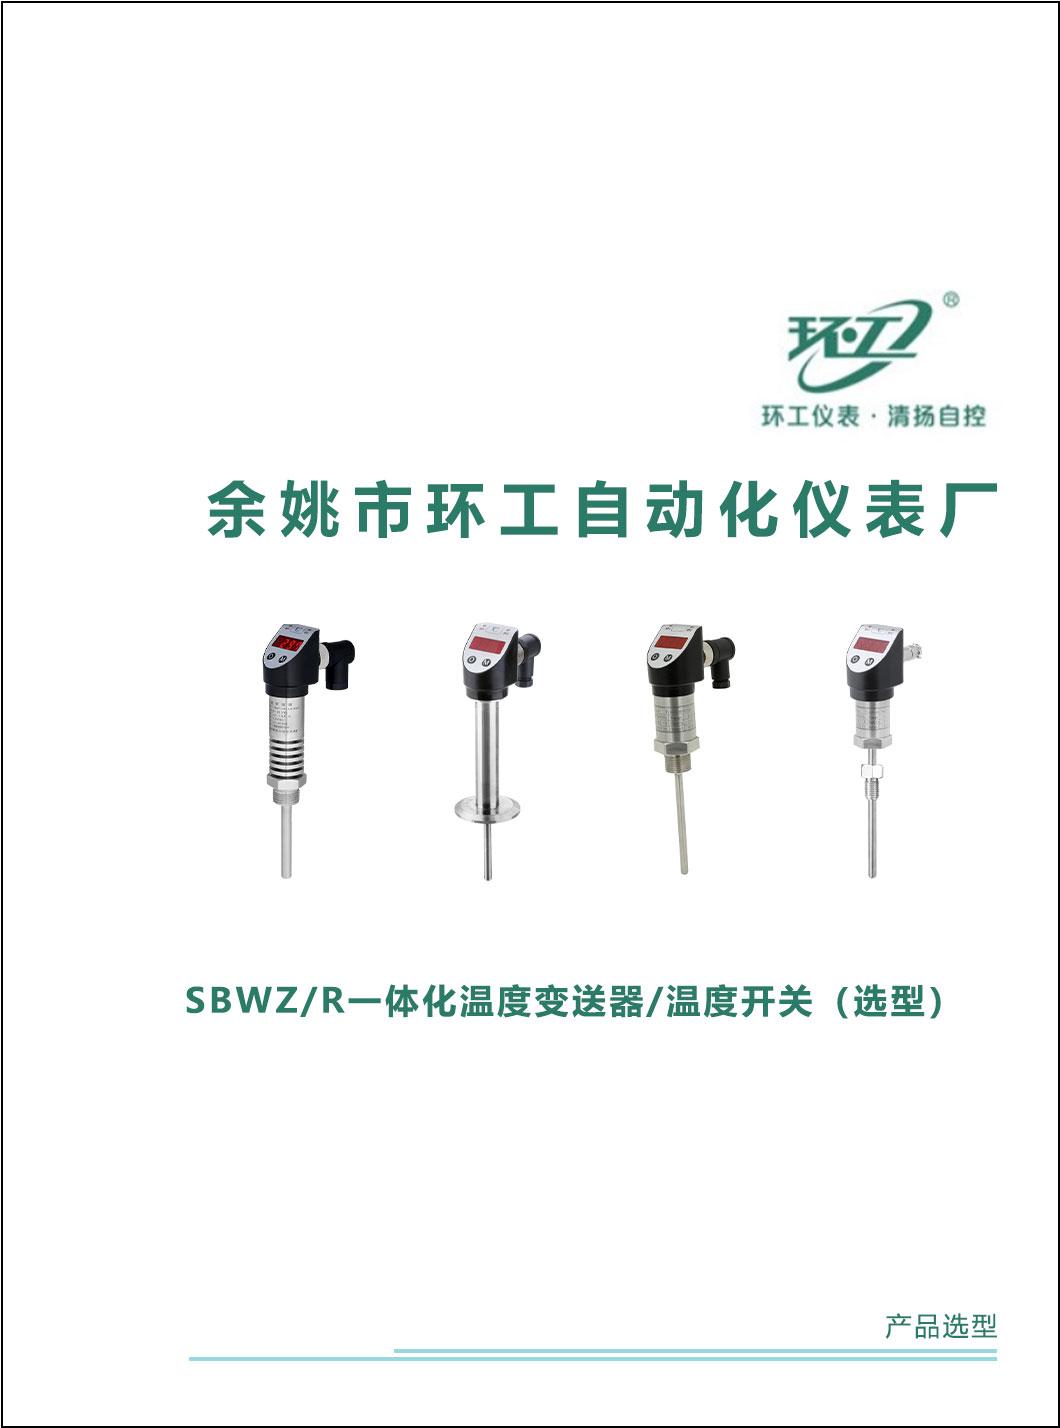 SBWZ/R一体化温度变送器/温度开关-环工仪表-清扬自控